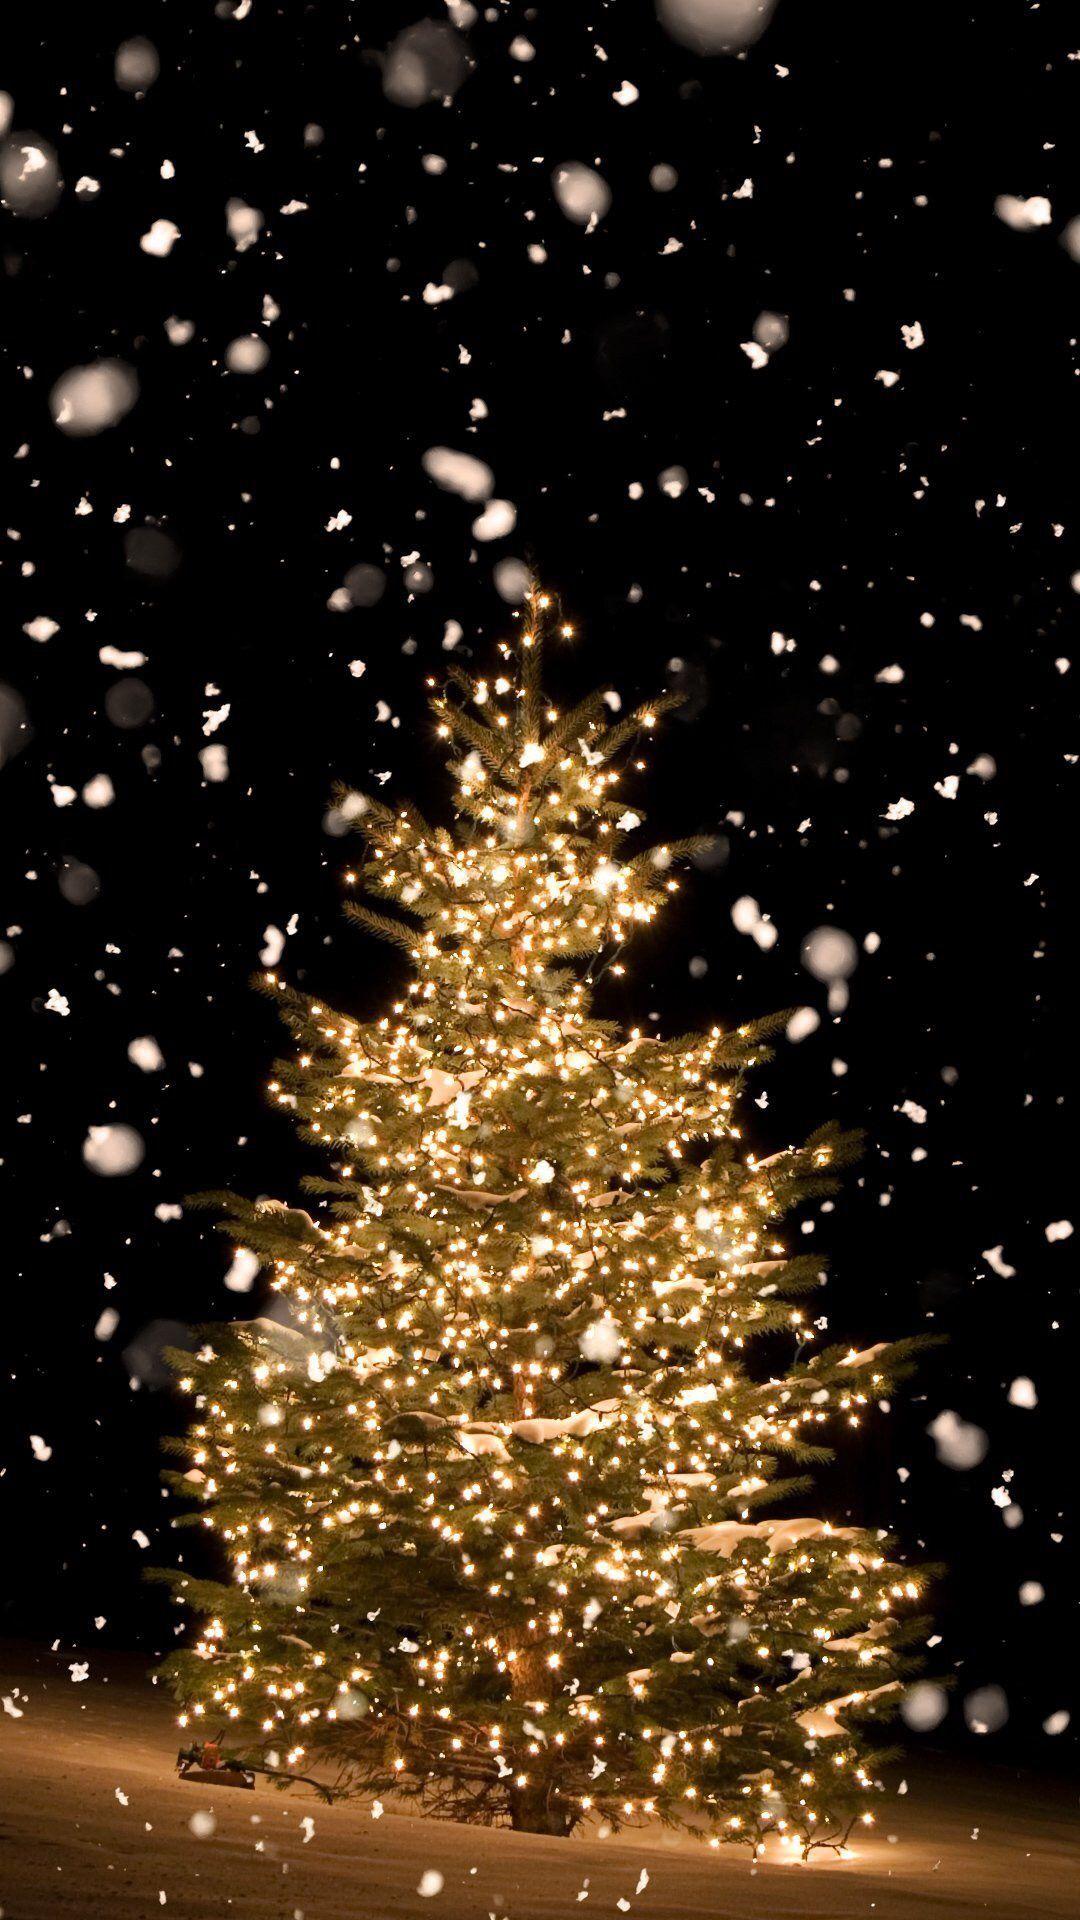 Beautiful Snow Wallpaper Iphone, Christmas Tree Wallpaper Iphone, Christmas  Phone Backgrounds, Holiday Iphone